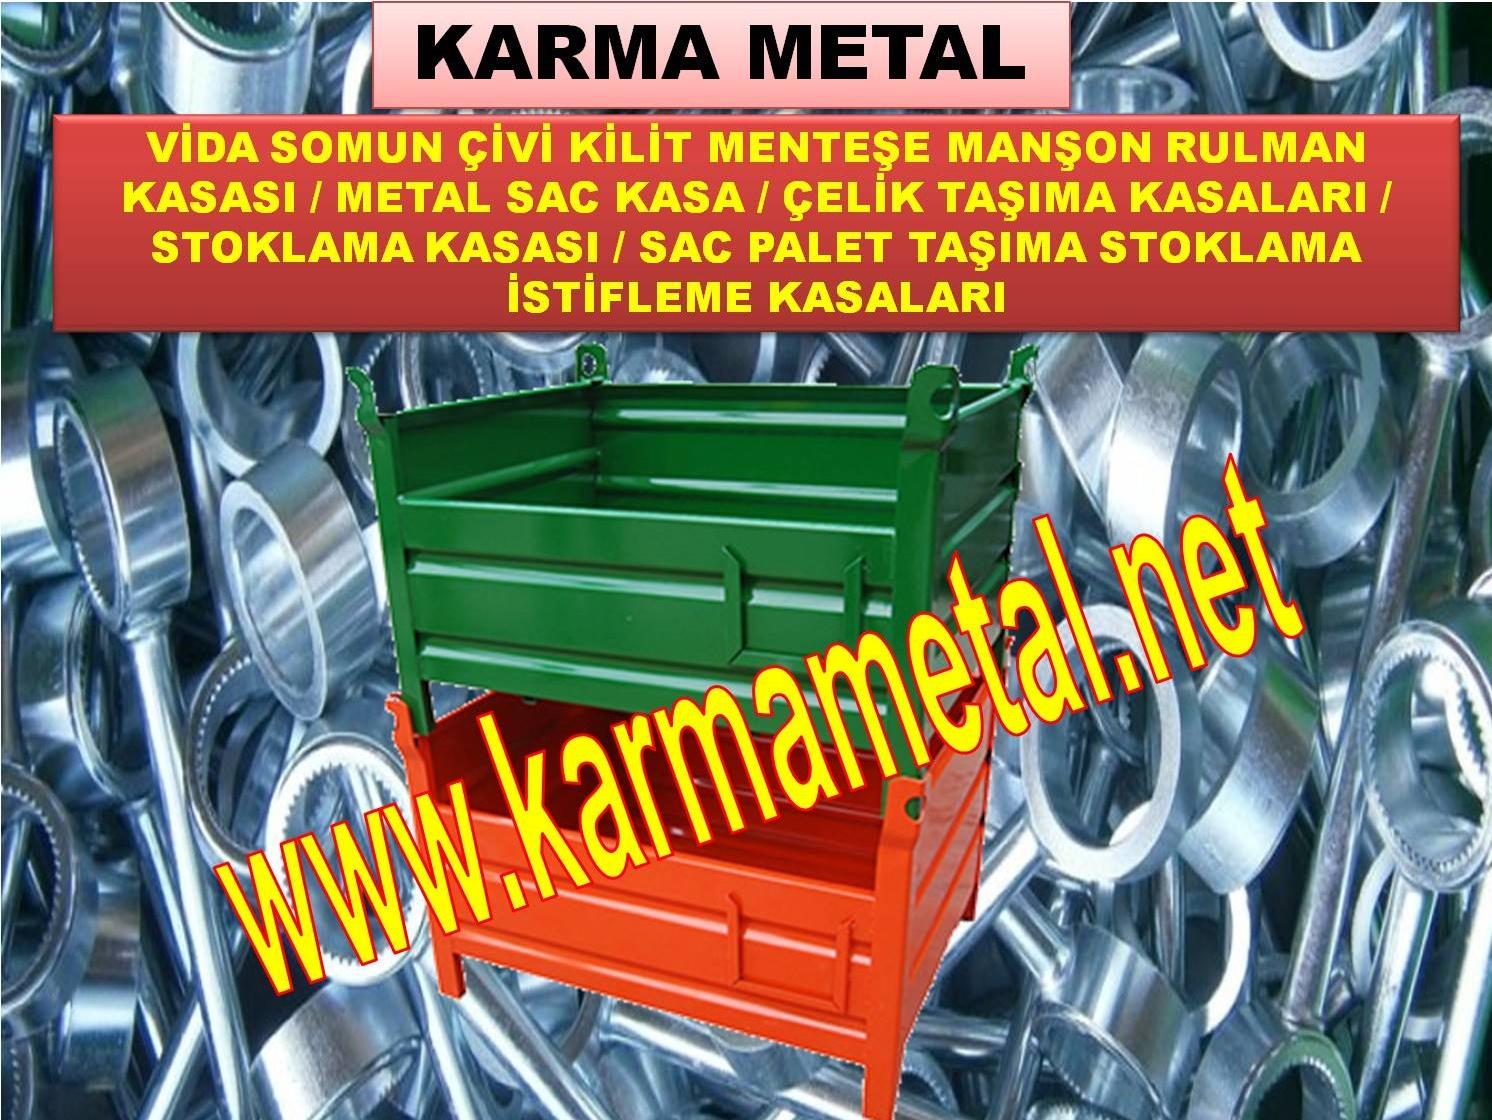 katlanabilir_katlanir__kasa__metal_celik_sac_tasima_stoklama_istifleme__kasasi_kasalari_sandiklari (10)